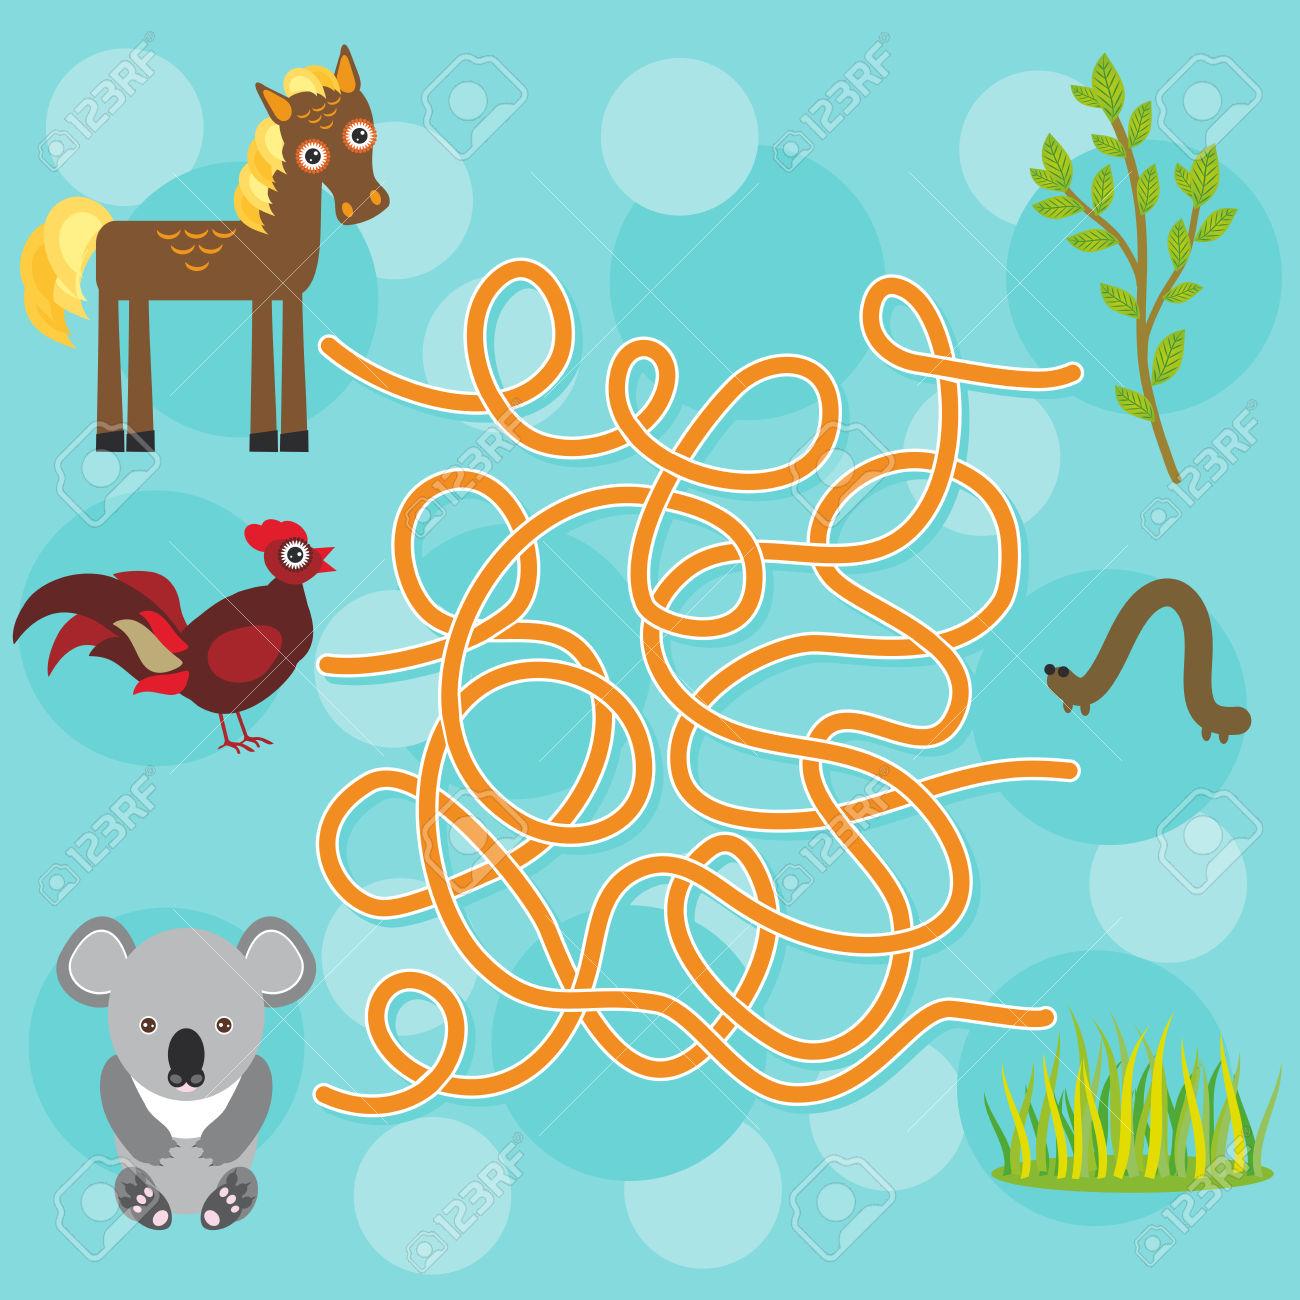 Chicken, Horse, Koala Labyrinth Game For Preschool Children.